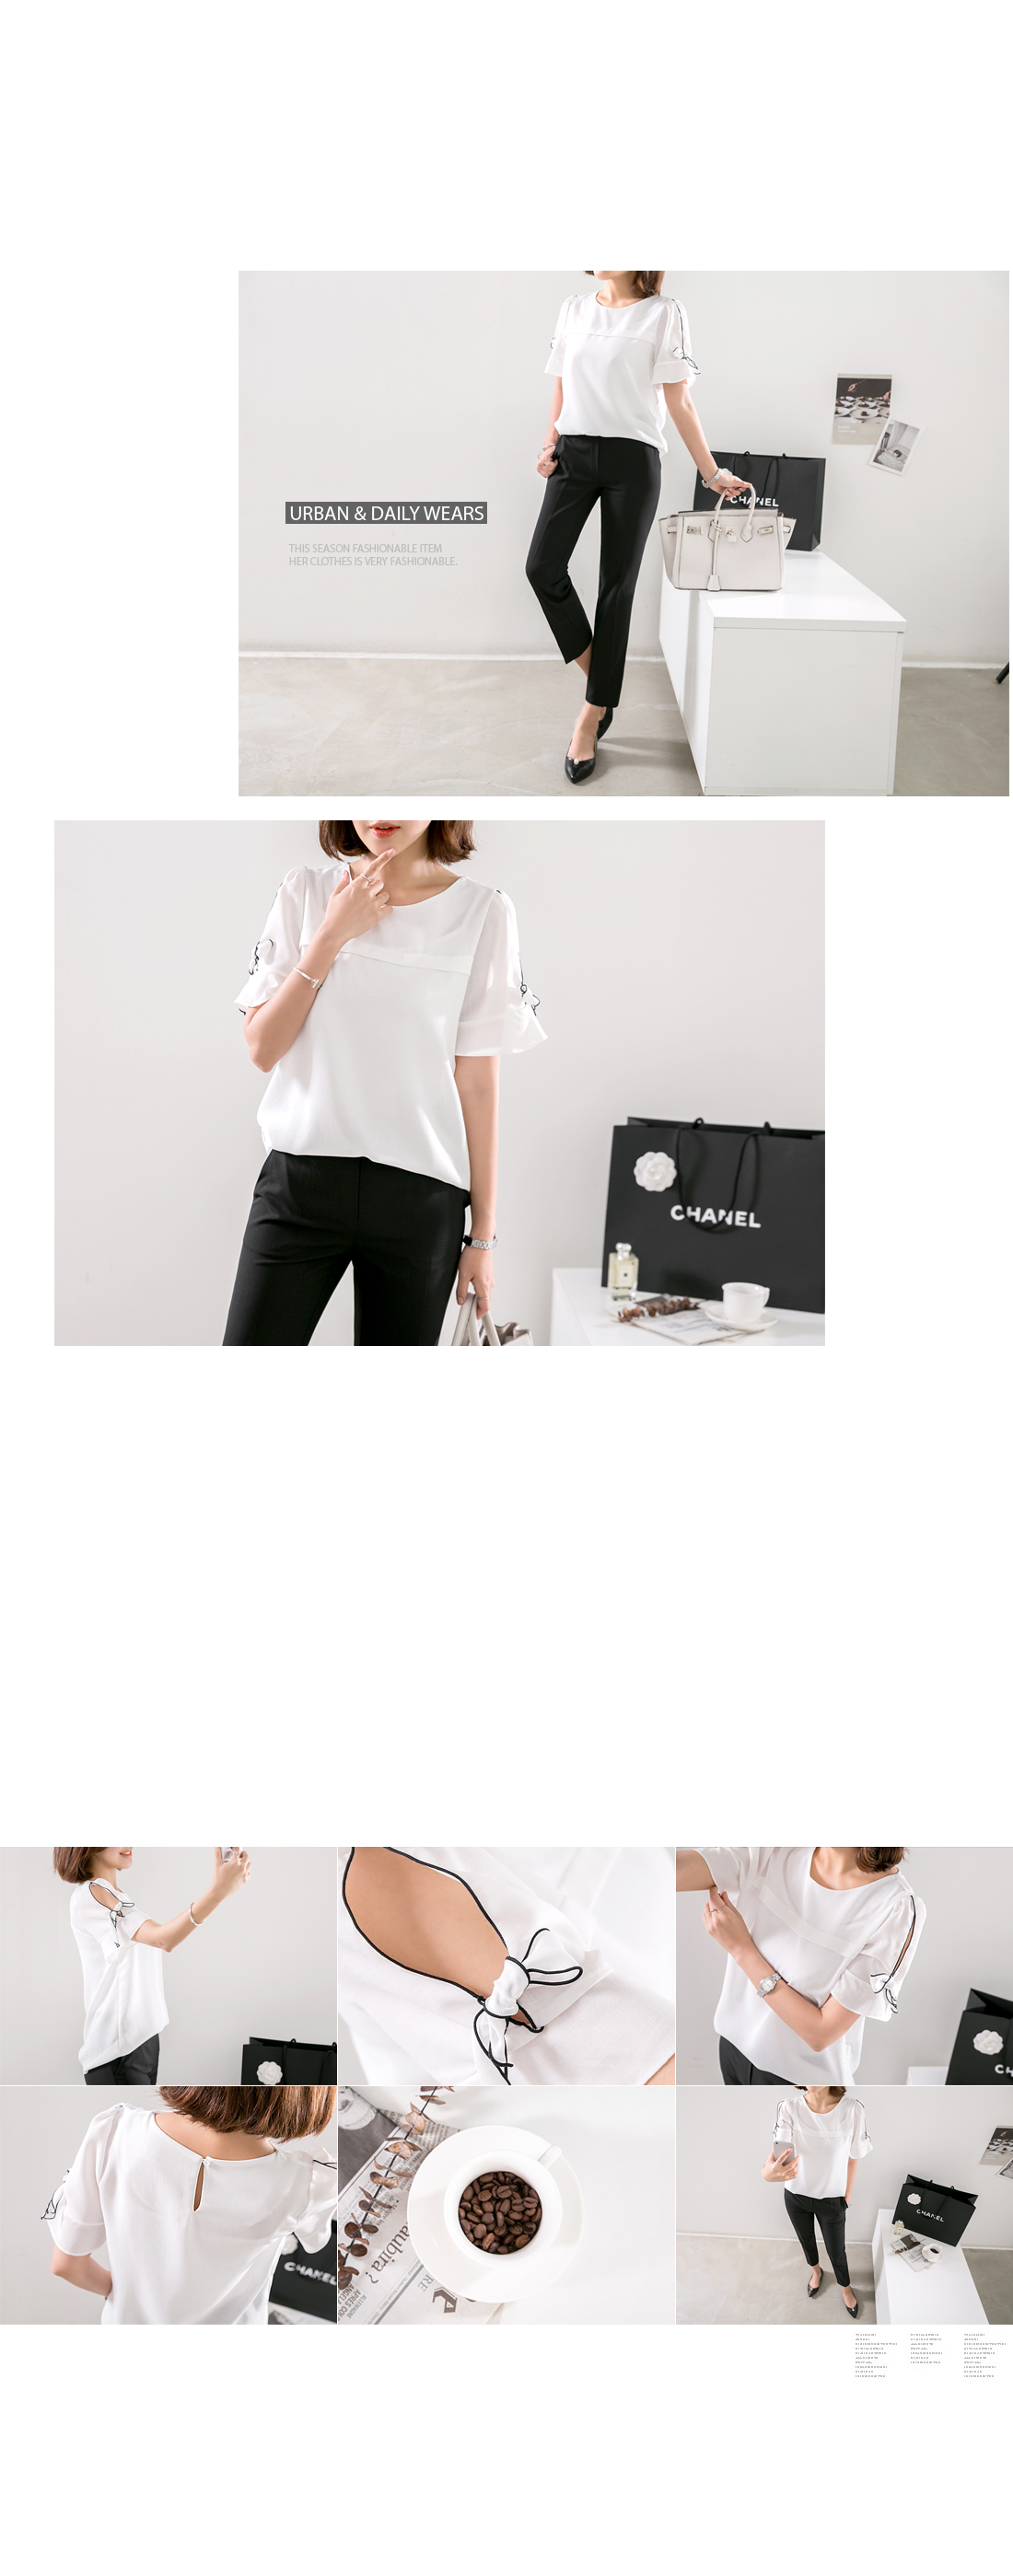 No. Retail Sleeve Ribbon Point Blouse #42706